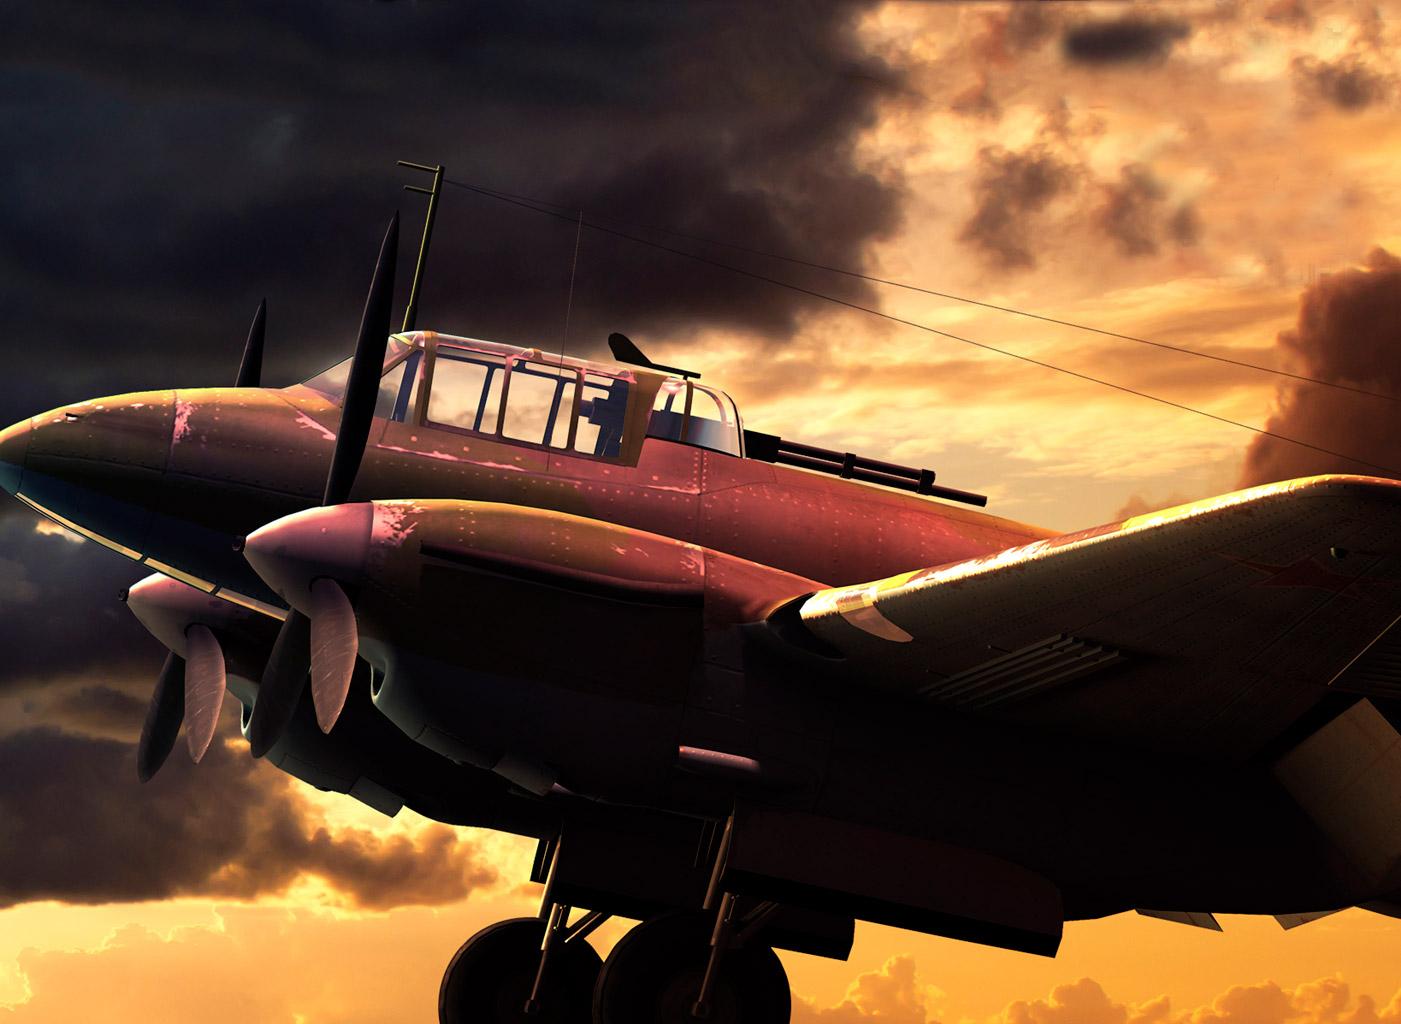 Free War Thunder Wallpaper in 1280x1024